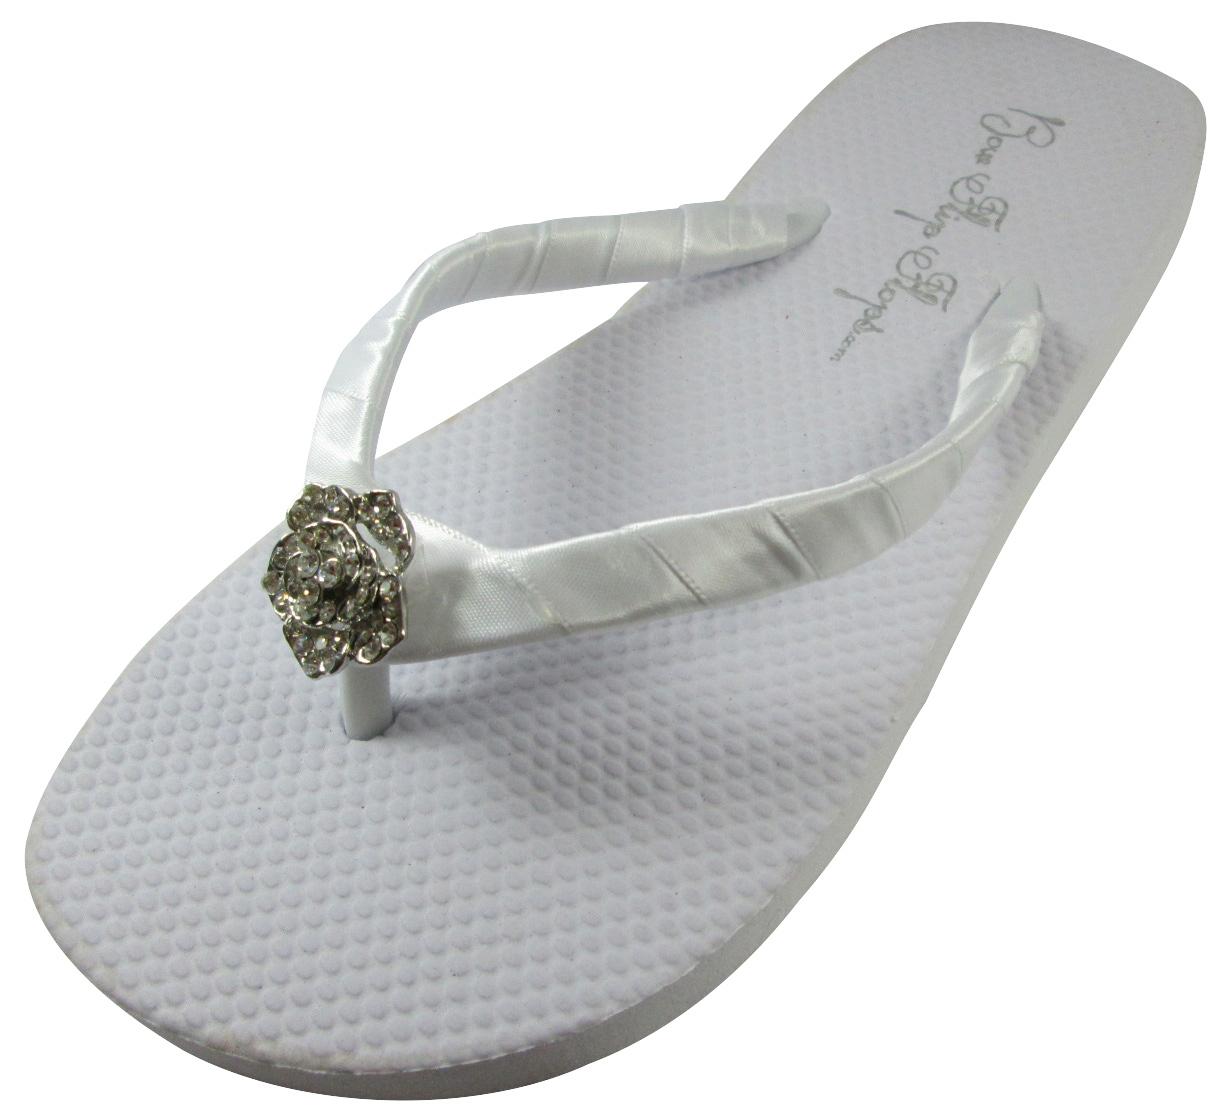 eb81cf0d0 Flat or Wedge Bridal Bridesmaid Flower Girl and 26 similar items